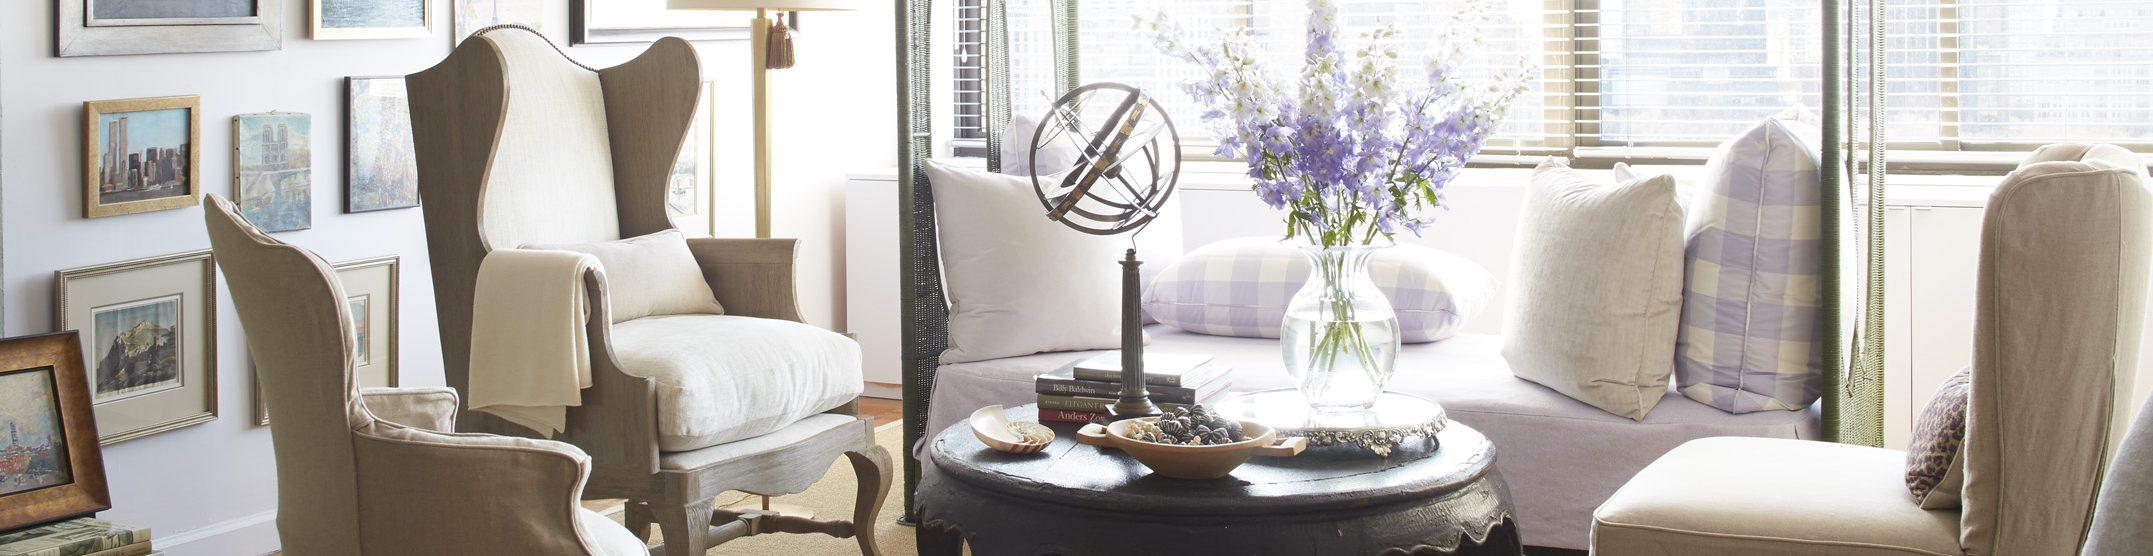 Frances Schultz living room NYC